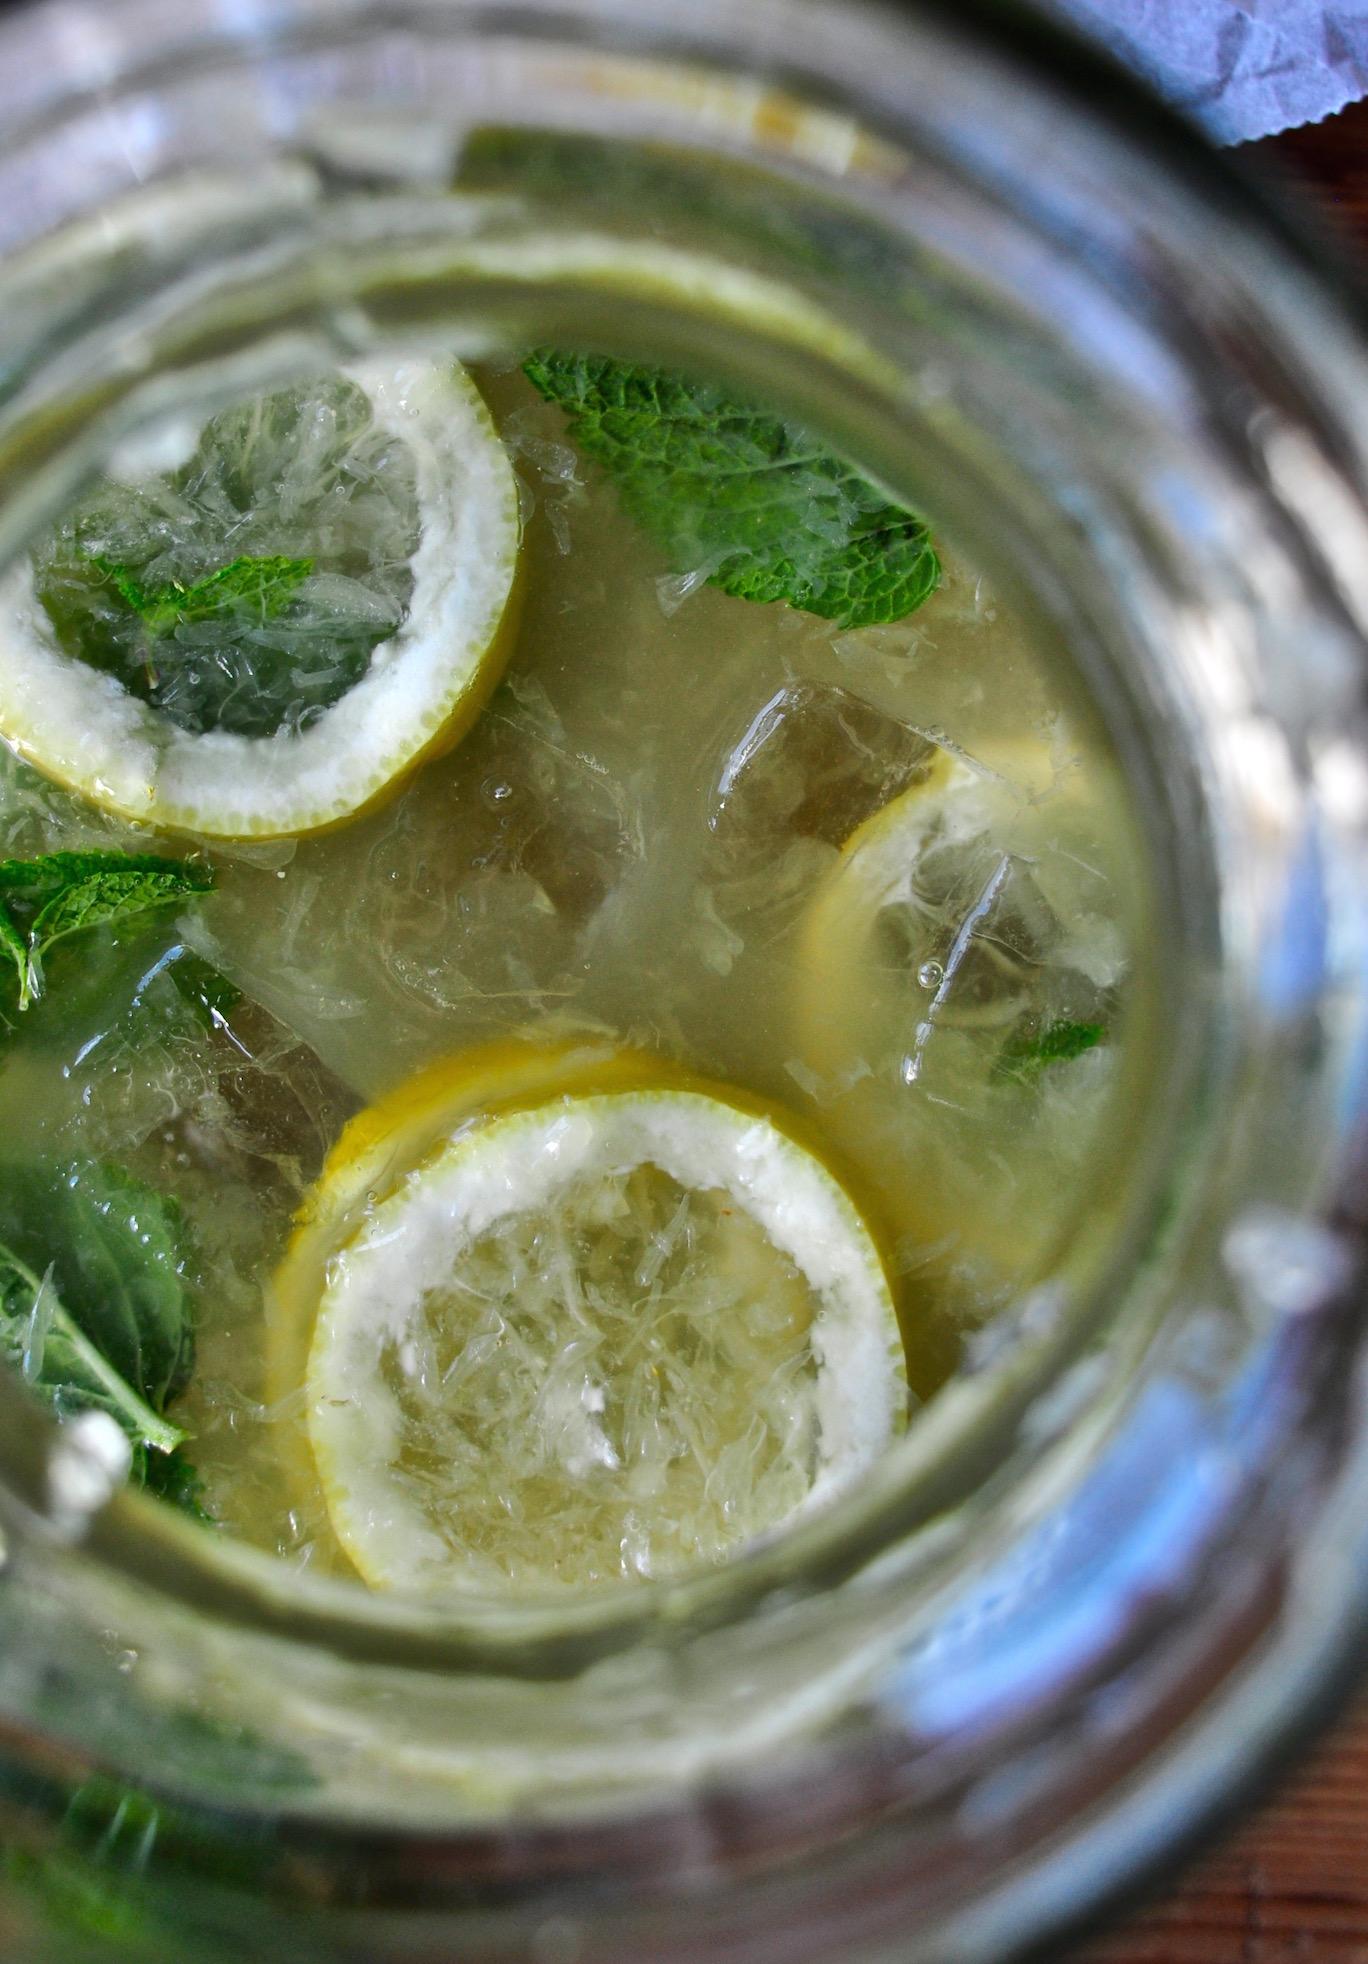 lemonade_kitchenhabitscom6